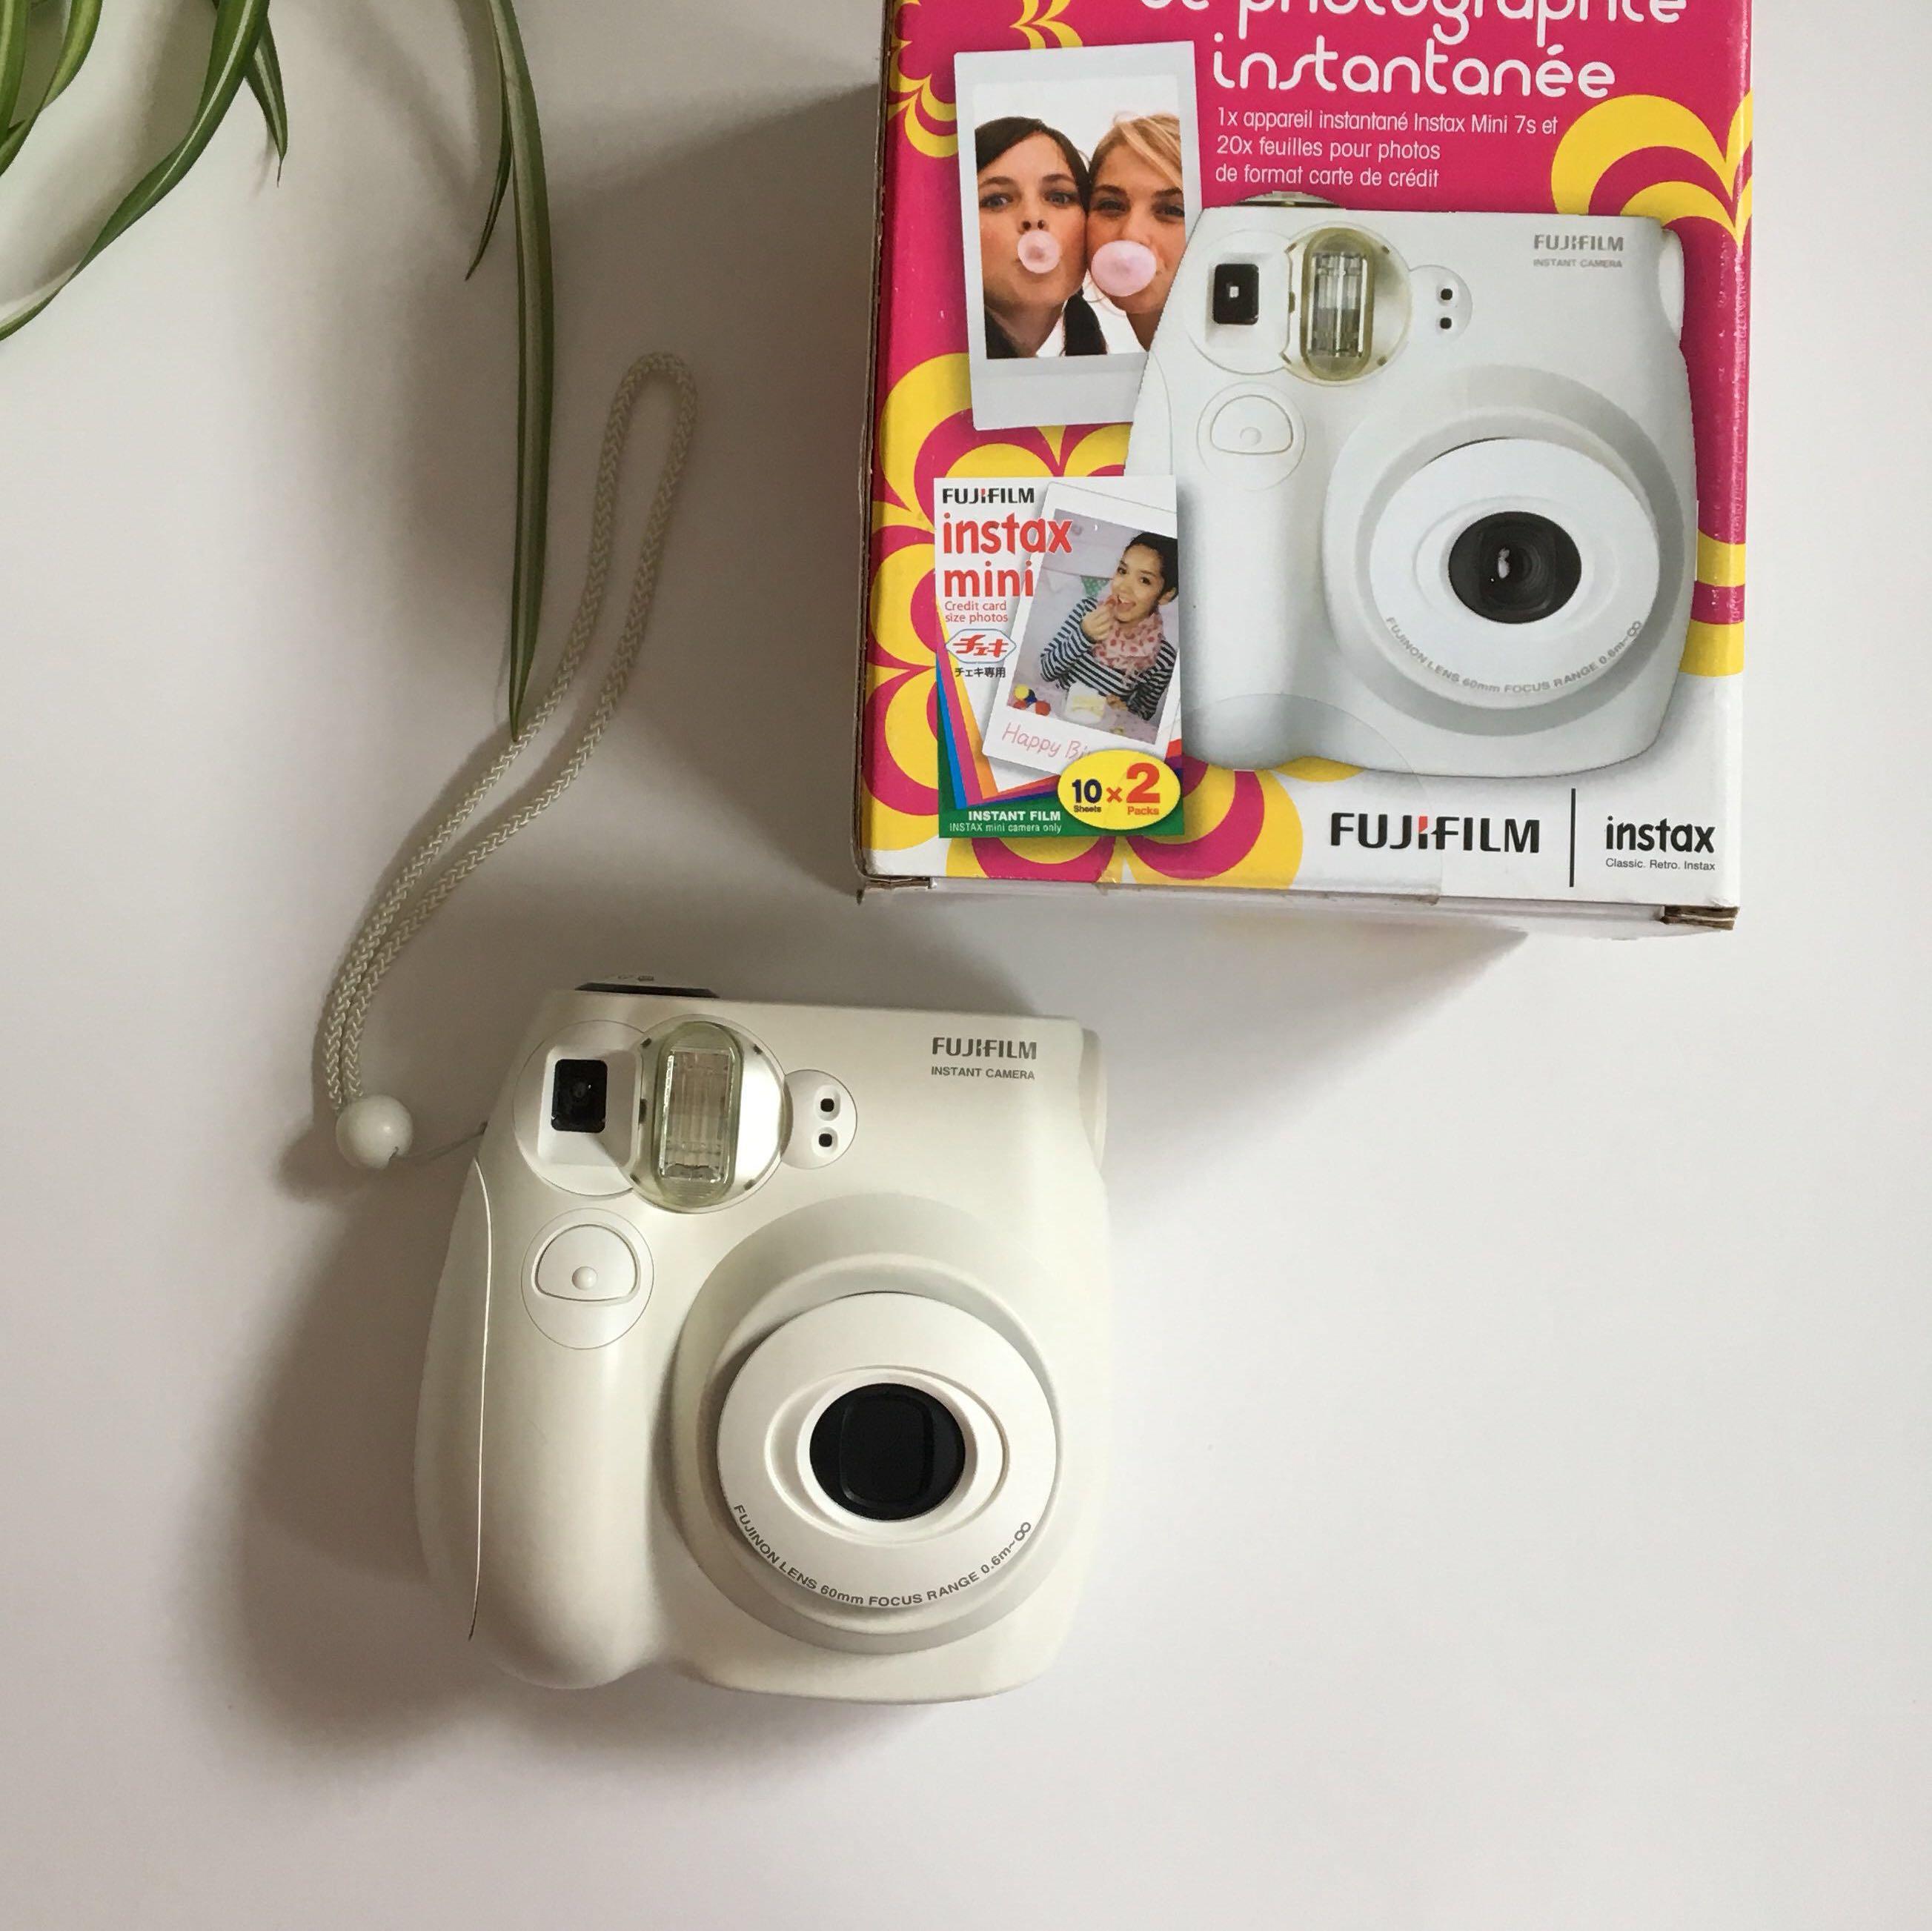 Fujifilm instax camera mini